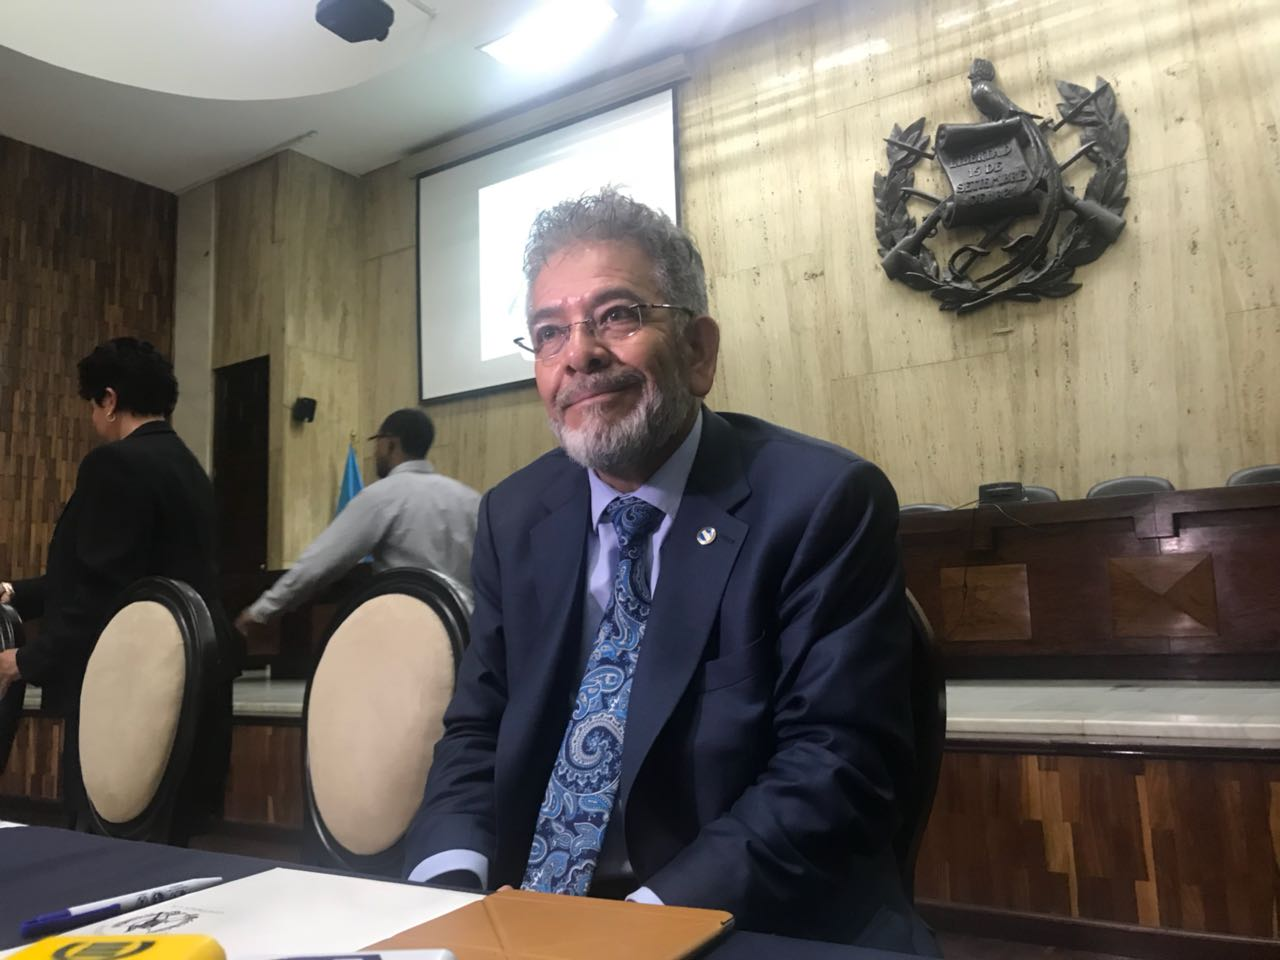 Miguel Ángel Gálvez EU Emisoras Unidas Guatemala